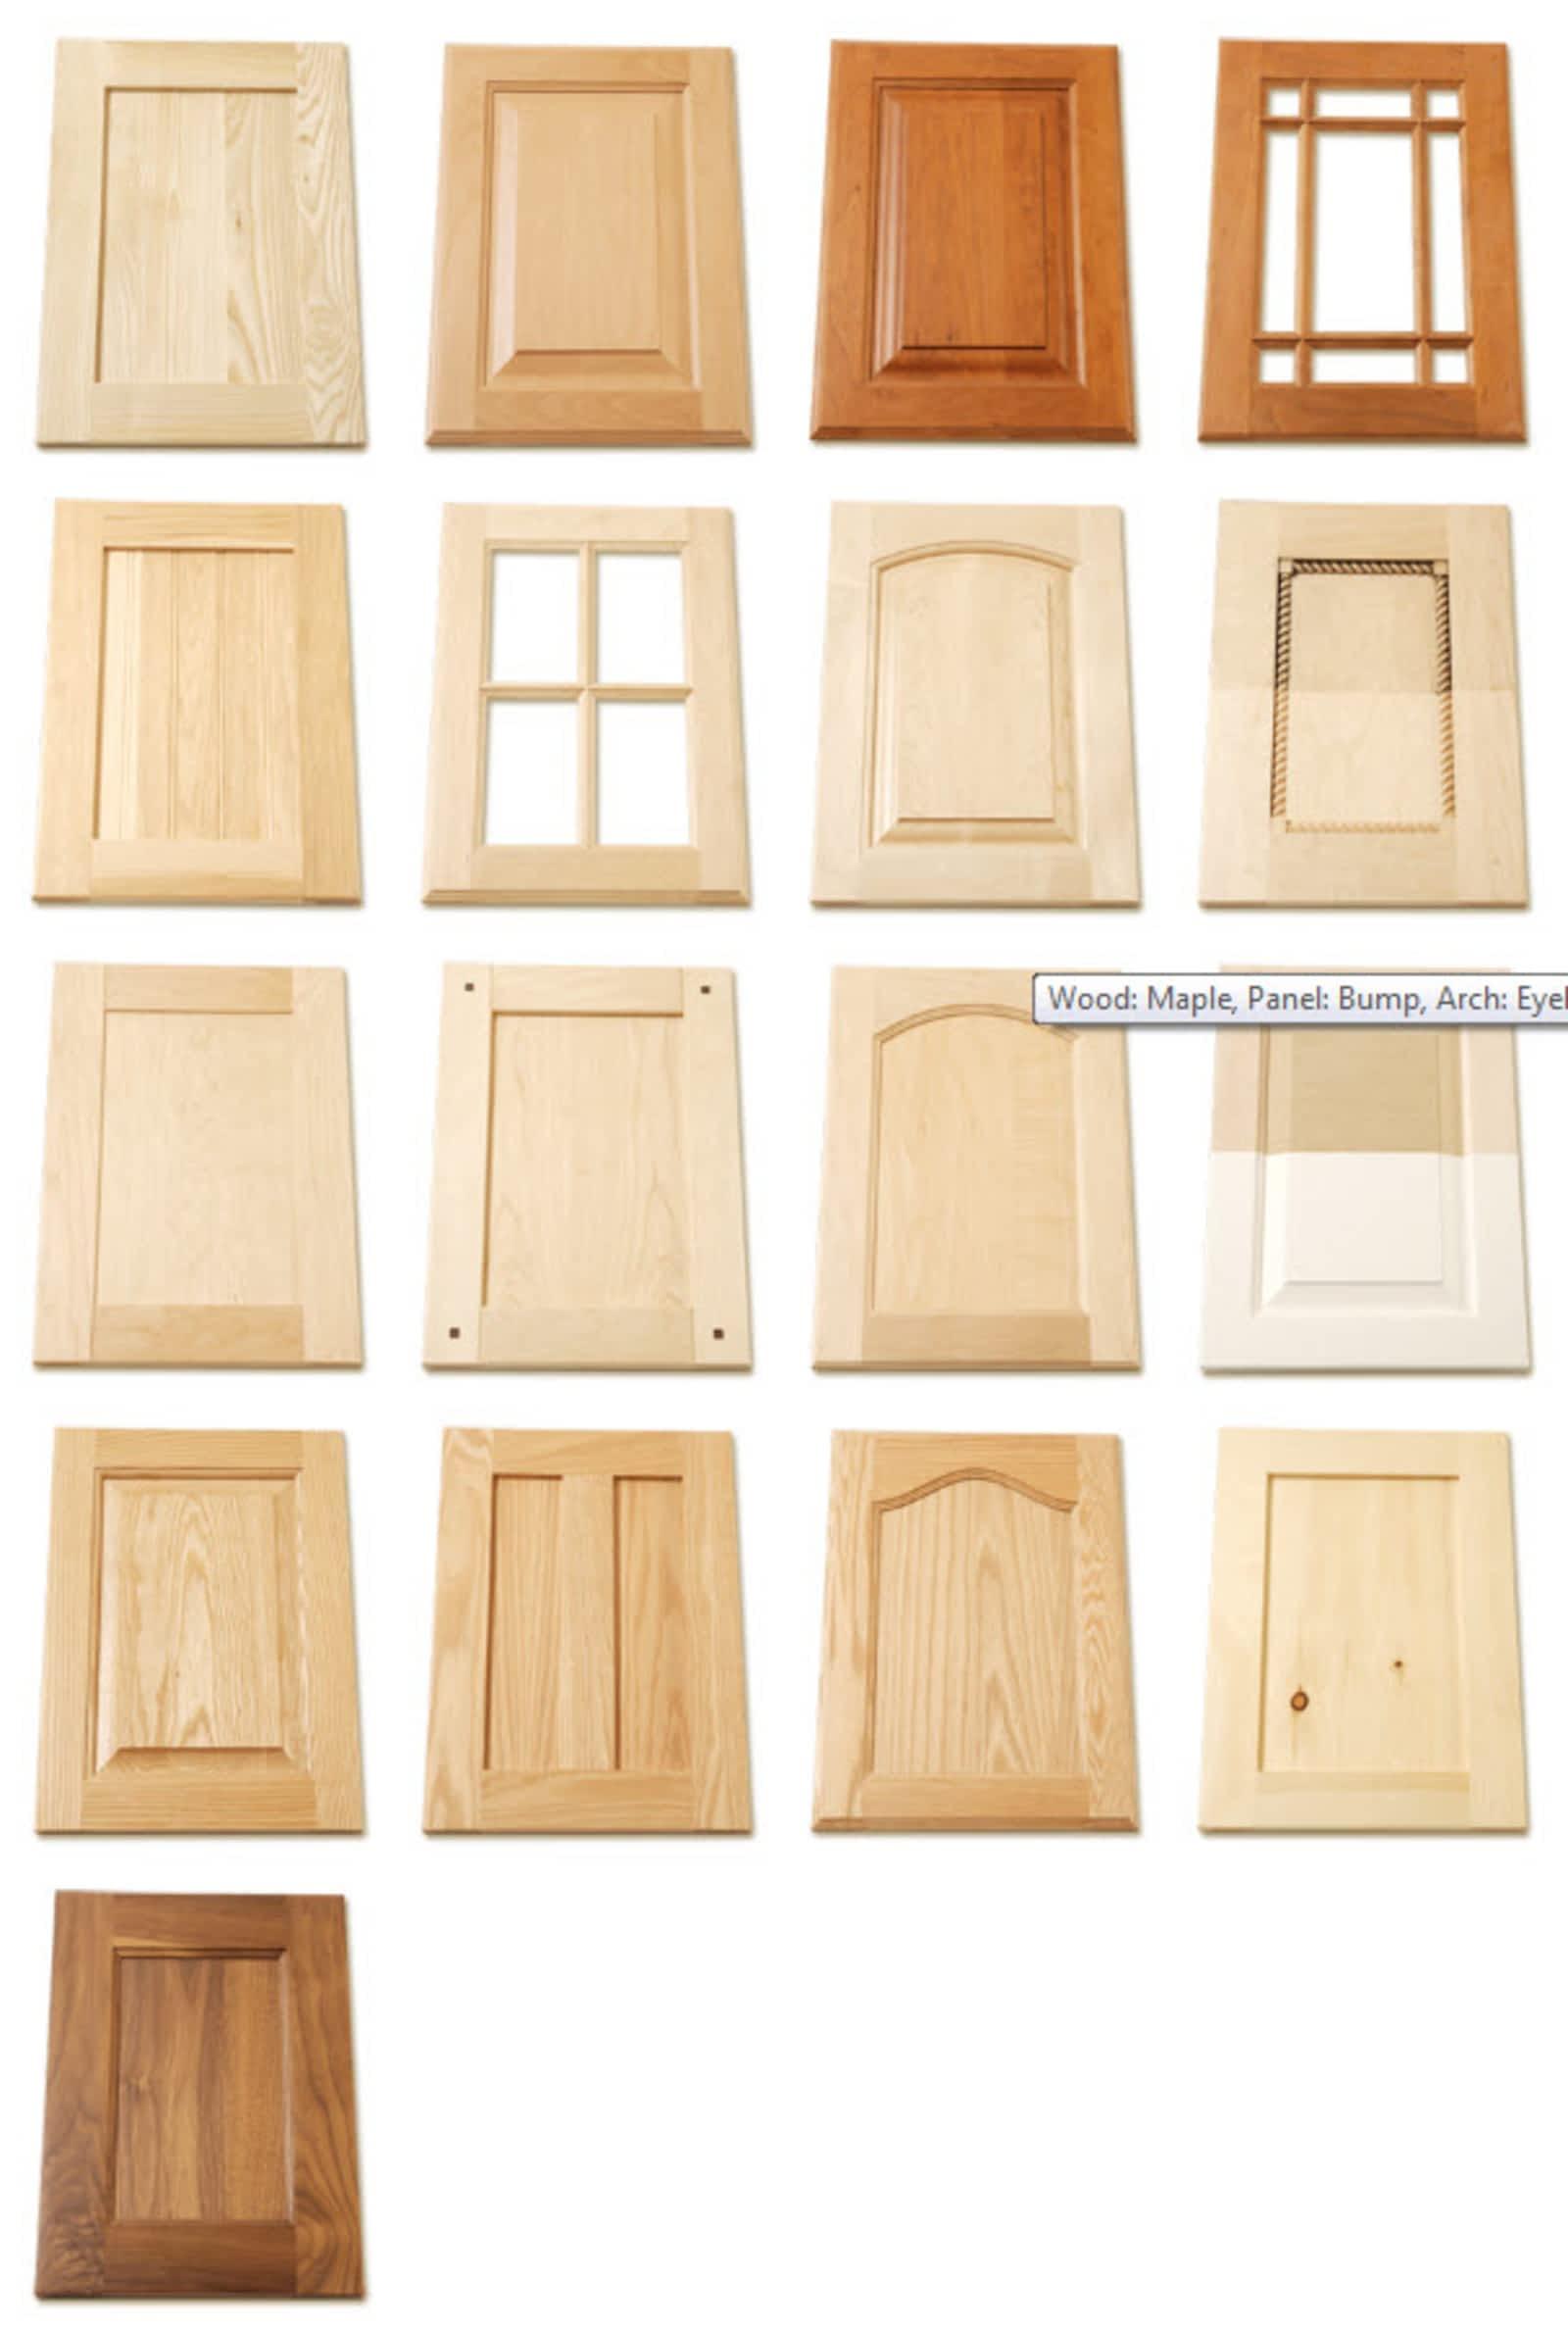 Deboers custom cabinet doors opening hours 7690 twelfth line alma on